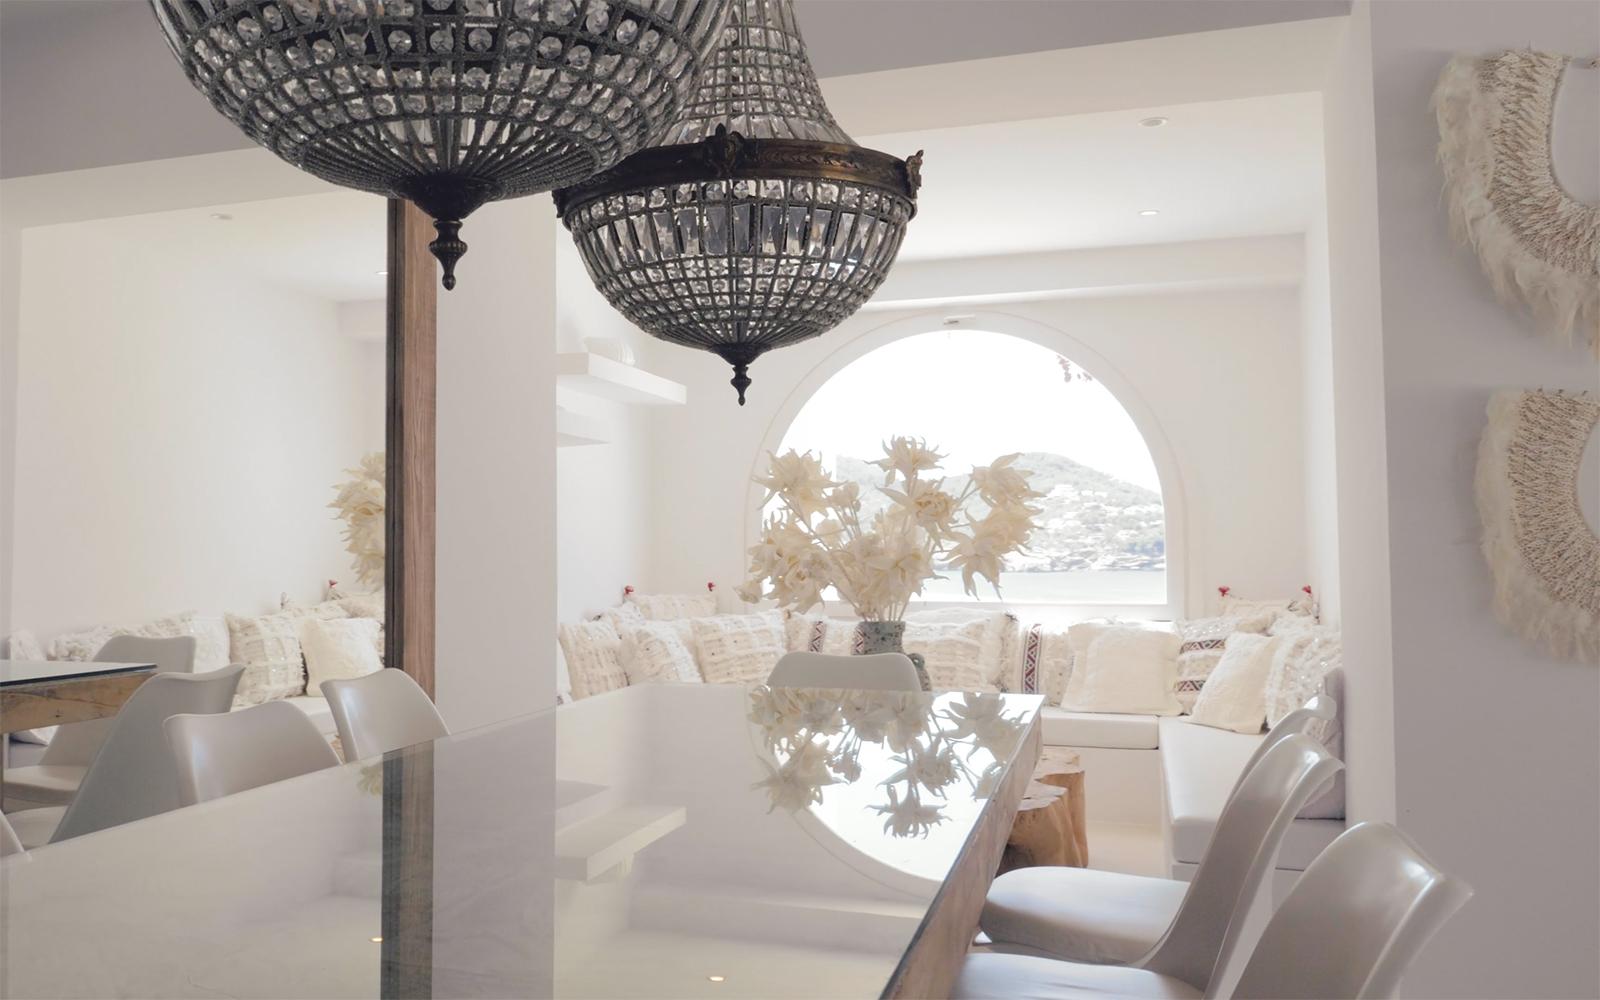 Ibiza villa, Yolanthe en Wesley Sneijder, Ibiza, Te huur, Villa, Luxe, High-end, Ibiza stijl, Eettafel, Eetkamer